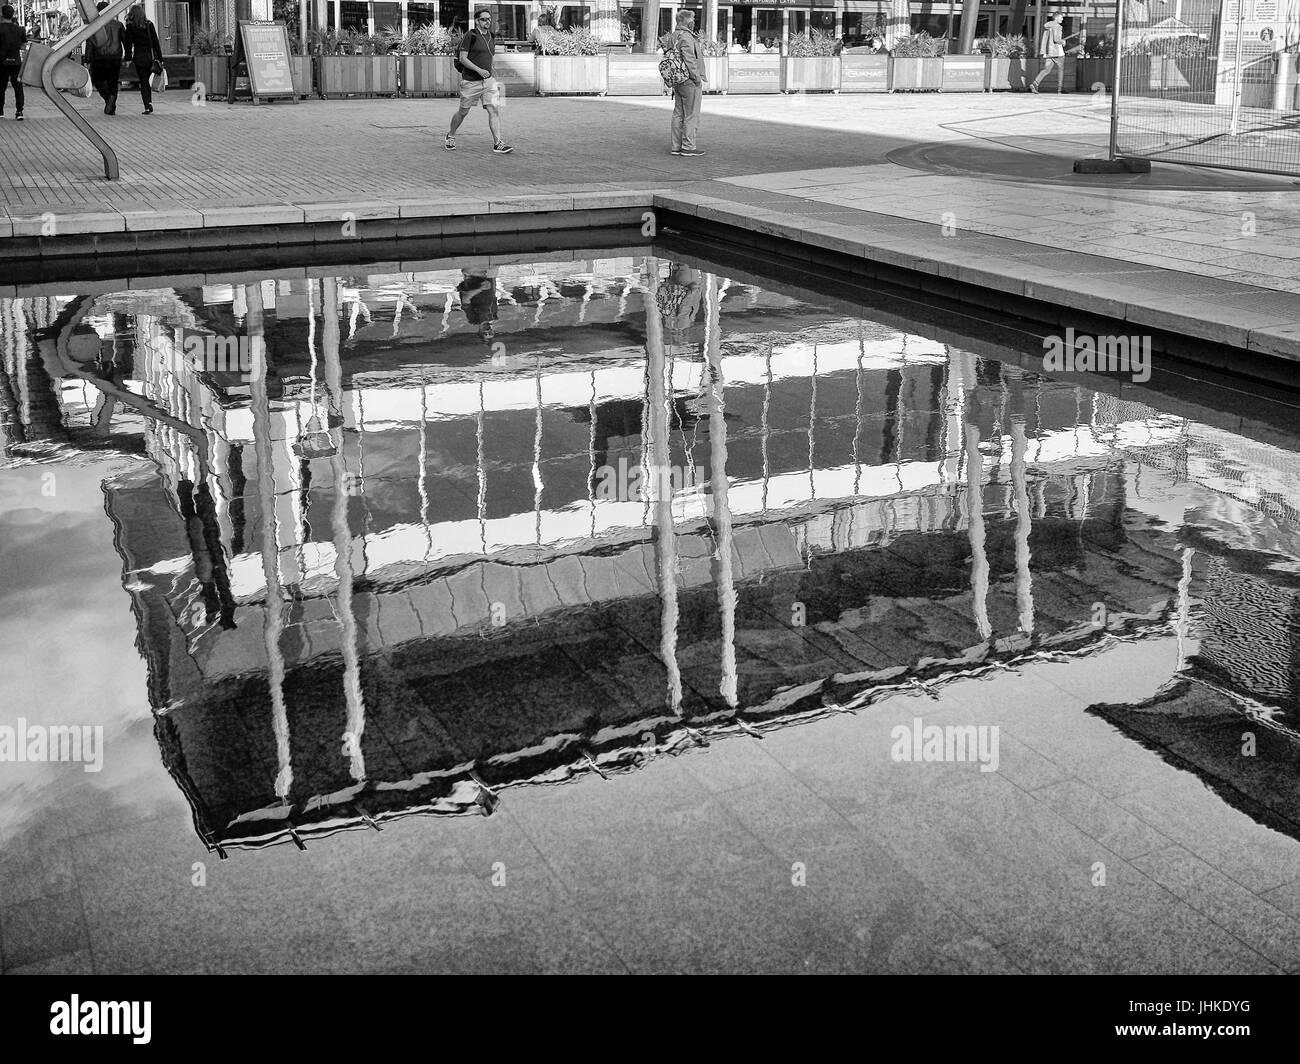 Street Photography Waterfront Bristol - Stock Image